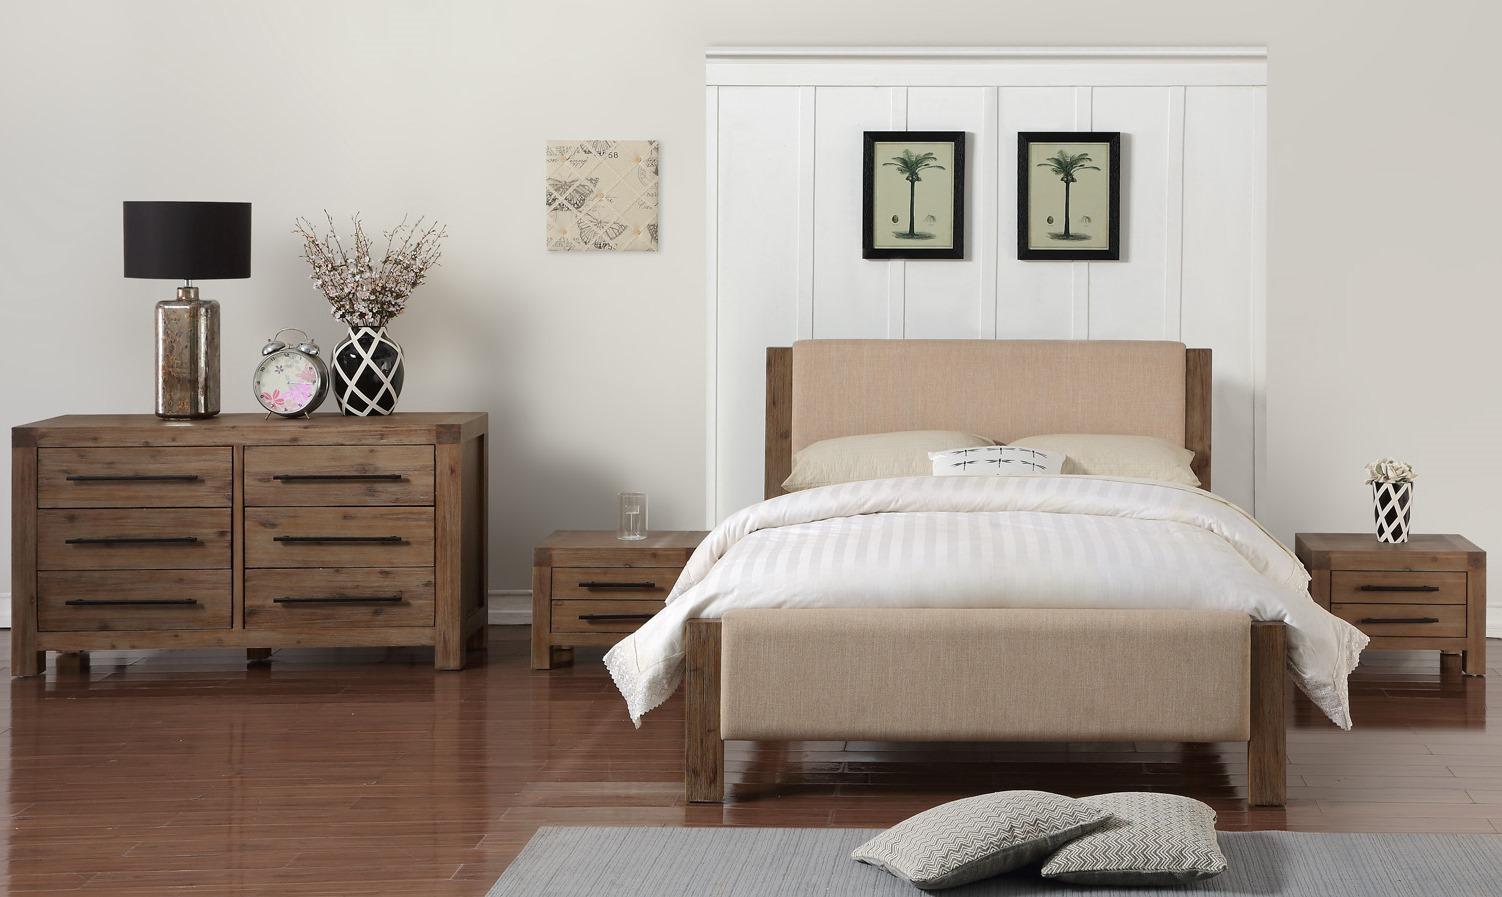 mobila din lemn masiv pentru dormitor Atlanta